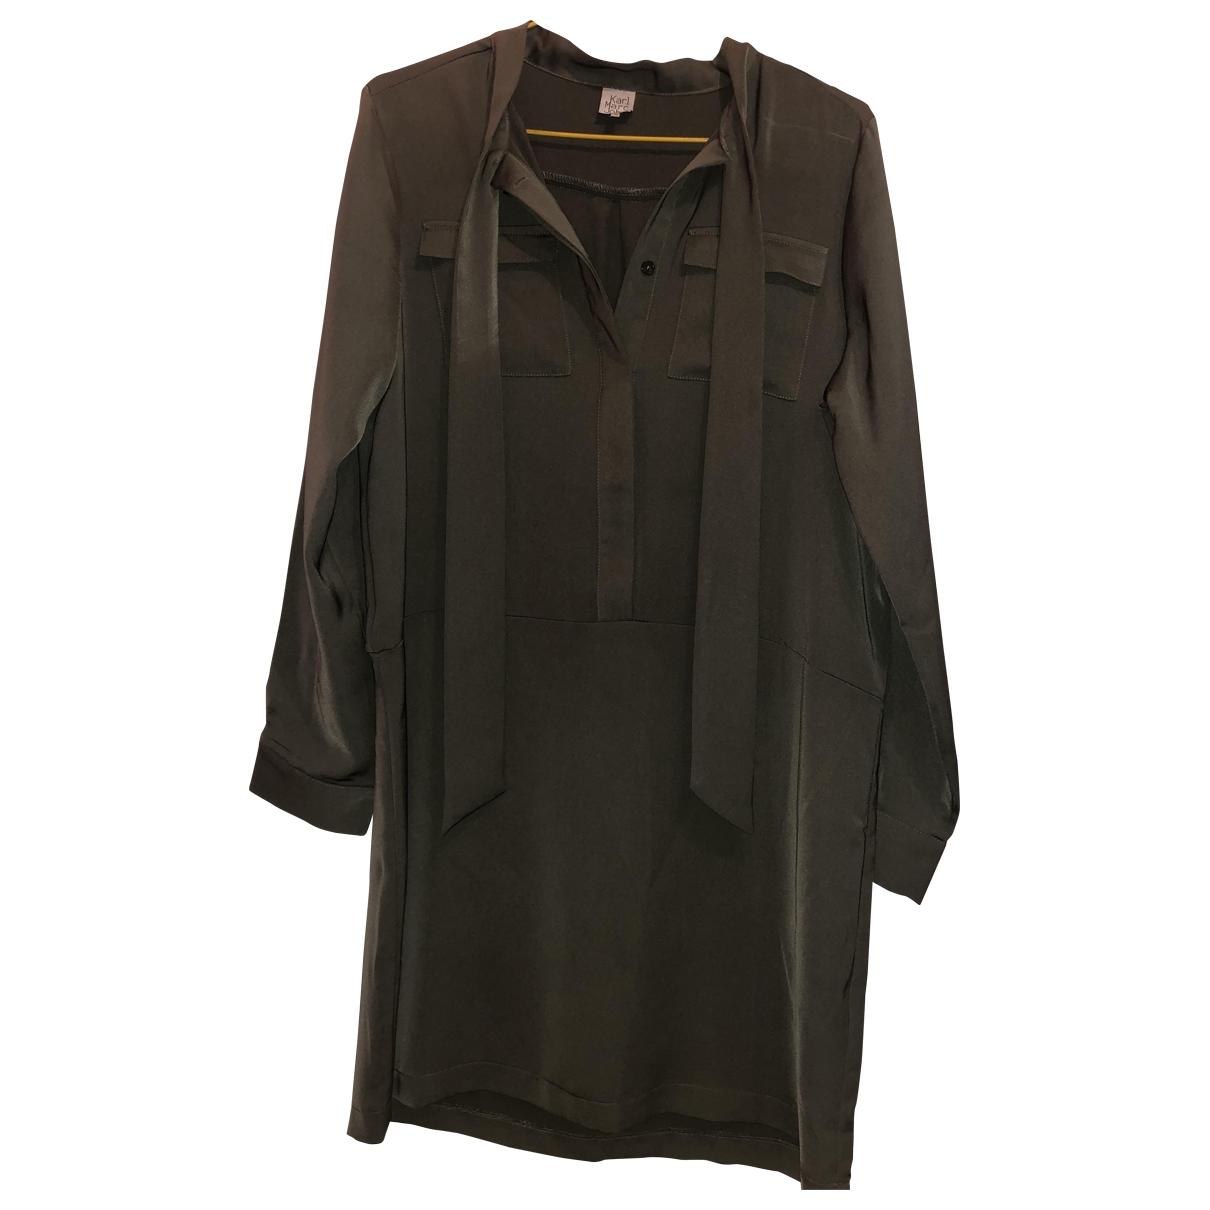 Karl Marc John \N Kleid in  Khaki Polyester